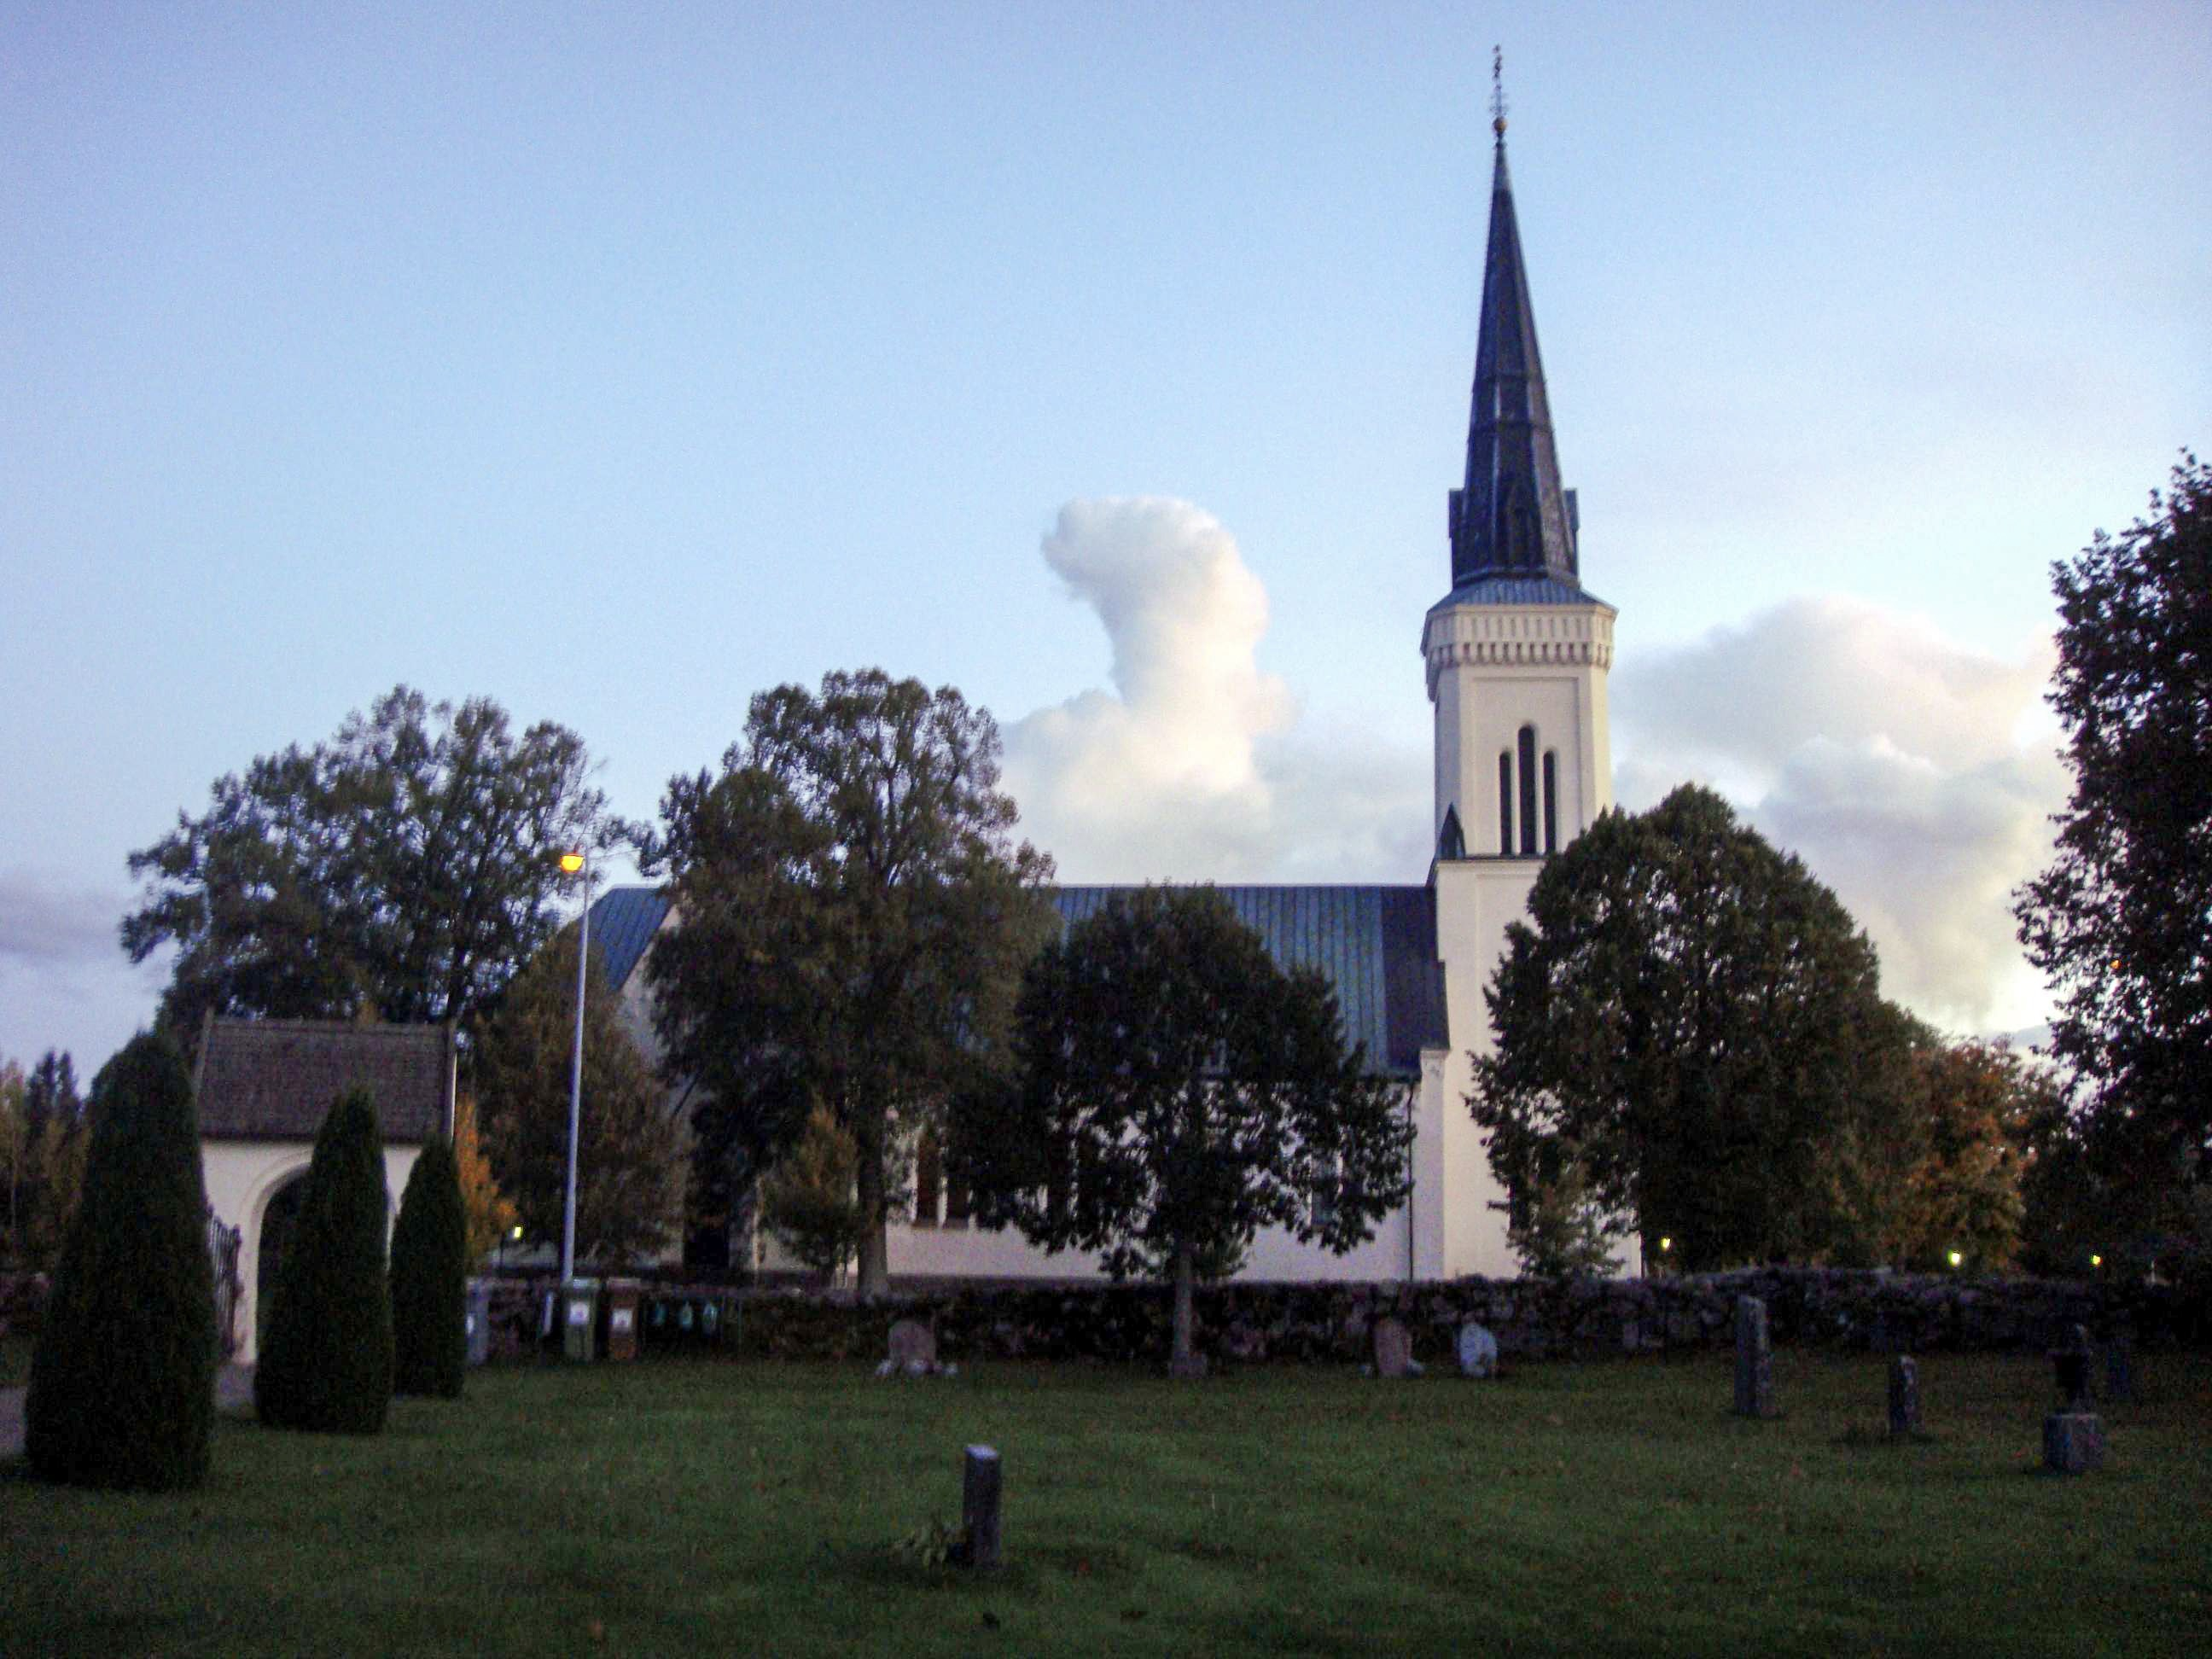 Fil:Vnga kyrka i Norrkpings kommun, den 11 - Wikipedia